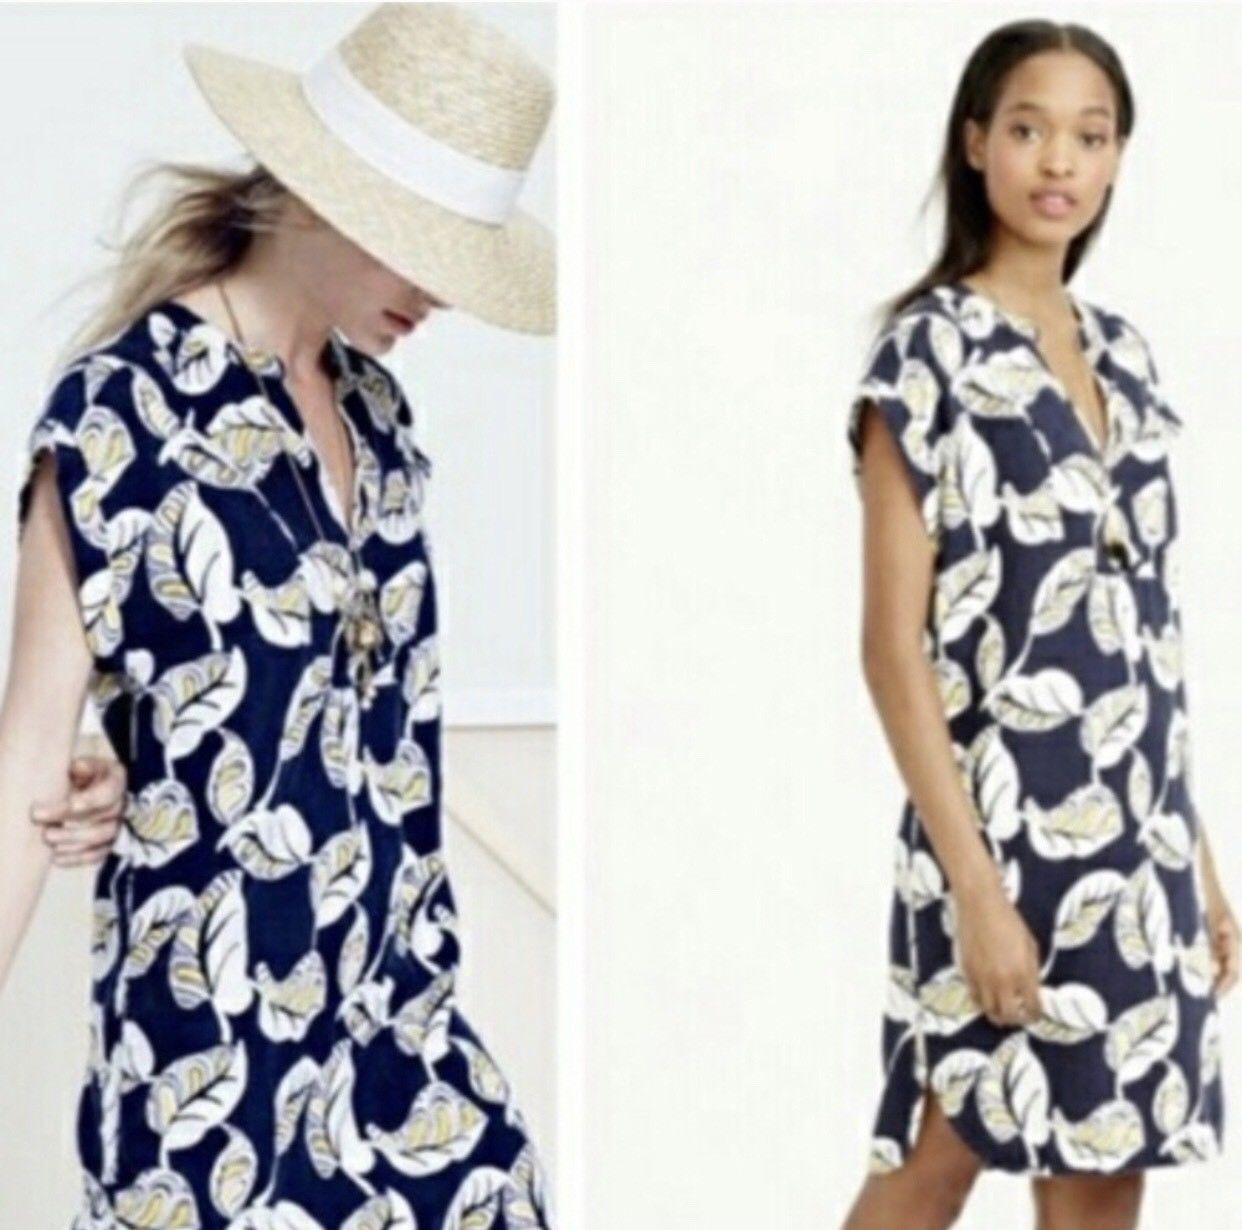 Cool NWT J Crew Womens Shift Dress Floral Print Black Size xxs MSRP ... 2fbe61766